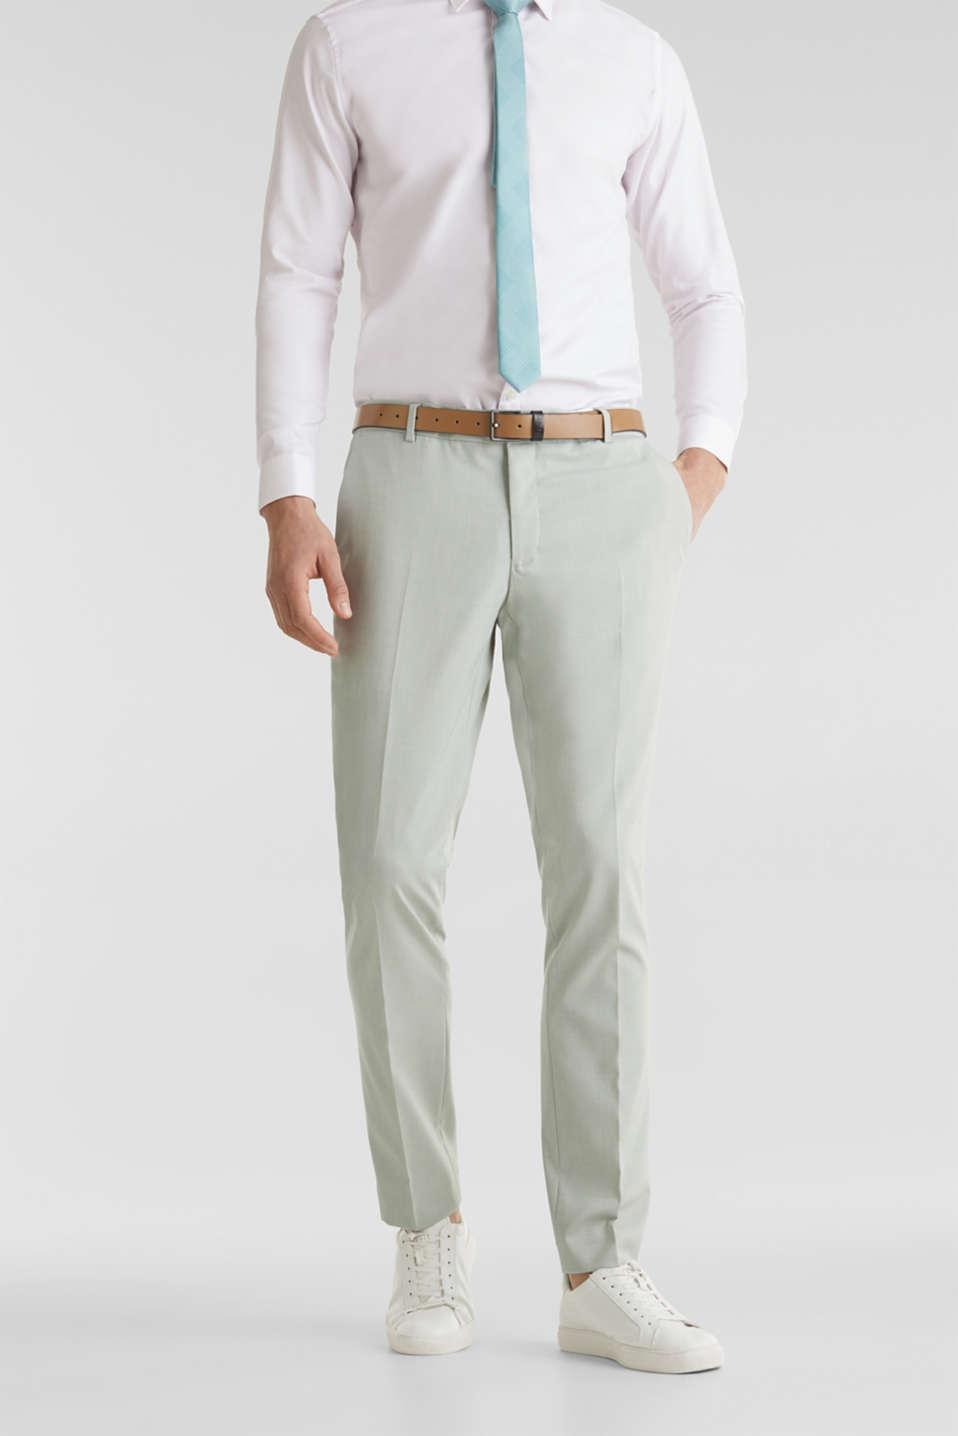 FINE MELANGE mix + match trousers, PASTEL GREEN 5, detail image number 0